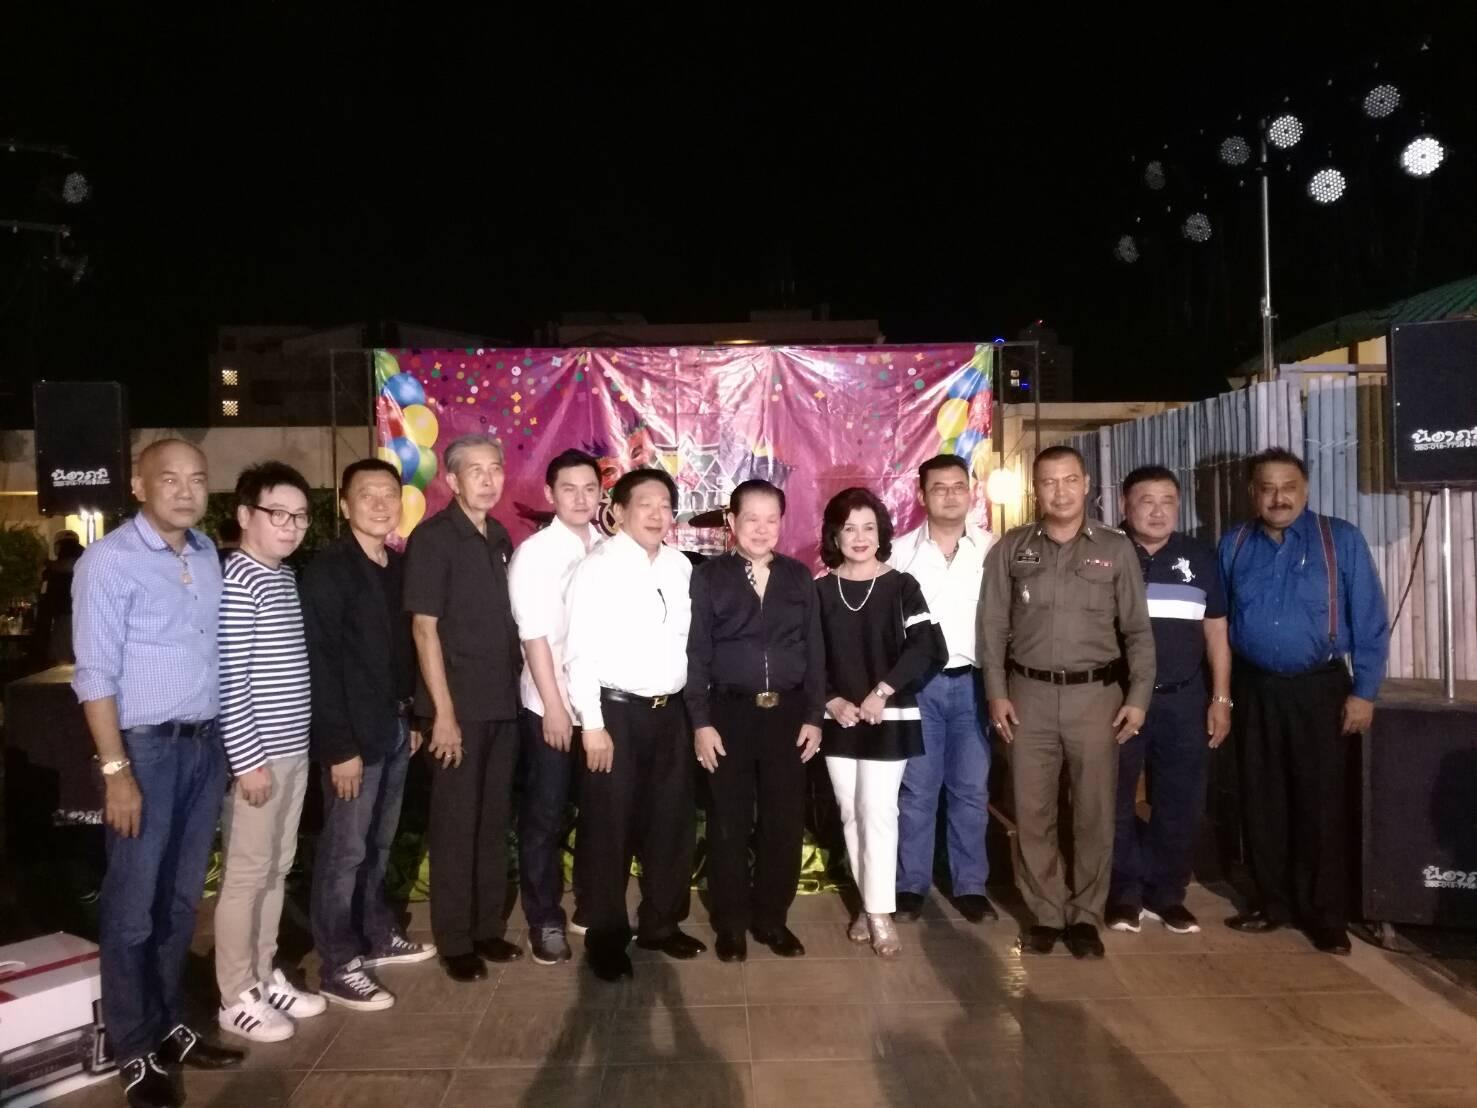 Guests of honour (l-r) Yuparaj Wongdaokul, secretary of the Buddha Amulet Club of Pattaya, Rattanachai Sutidechanai, former chairman of the Pattaya City Culture and Tourism Council, Niran Wattanasartsathorn, former mayor of Pattaya, Saksit Yaemsri, Pattaya city councilor, Rattakij Hengtrakul, managing director of Sopon Cable TV, Chanyut Hengtrakul, president of the Thai Tenpin Bowling Association, former MP Santsak and Kobkool Ngampiches, Krit Jiramongkol, VP of the Pattaya Business and Tourism Association, Pol. Col. Apichai Kroppech, Pattaya police chief, Chartchai Sawaenghasup, advisor to the World Gems Group, and Pratheep Malhotra, MD of Pattaya Mail.